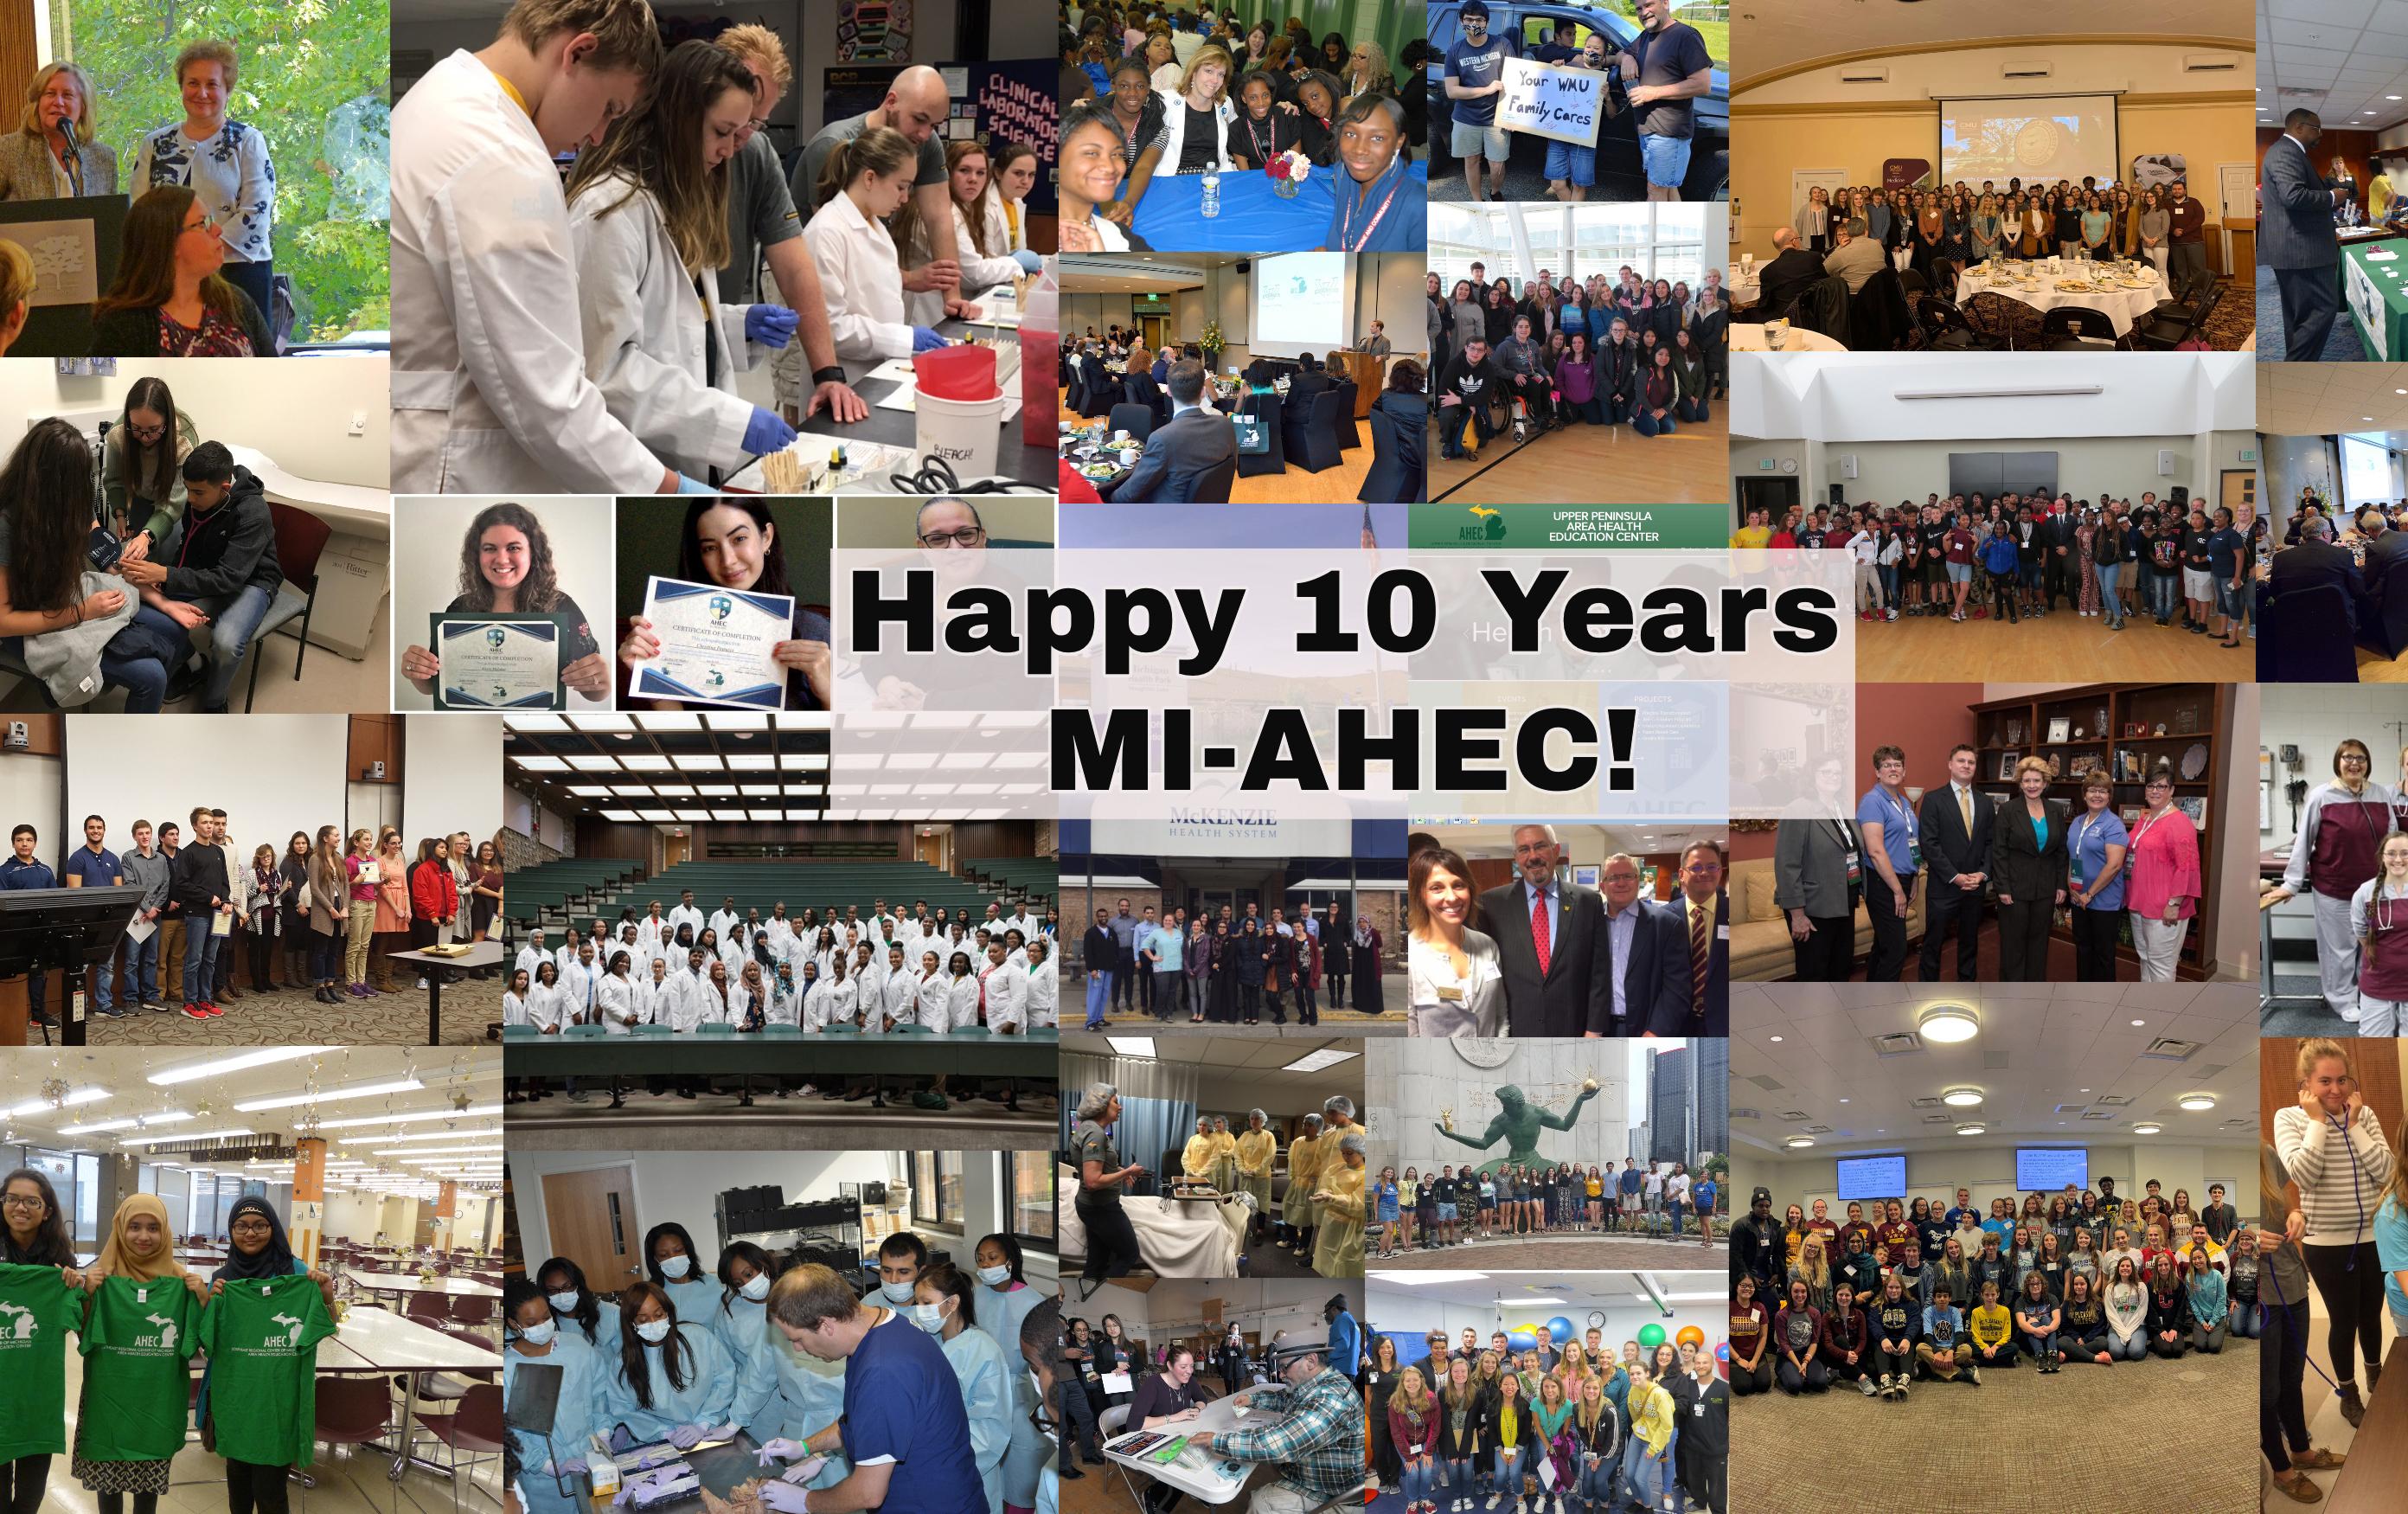 Michigan AHEC Celebrates 10 Years